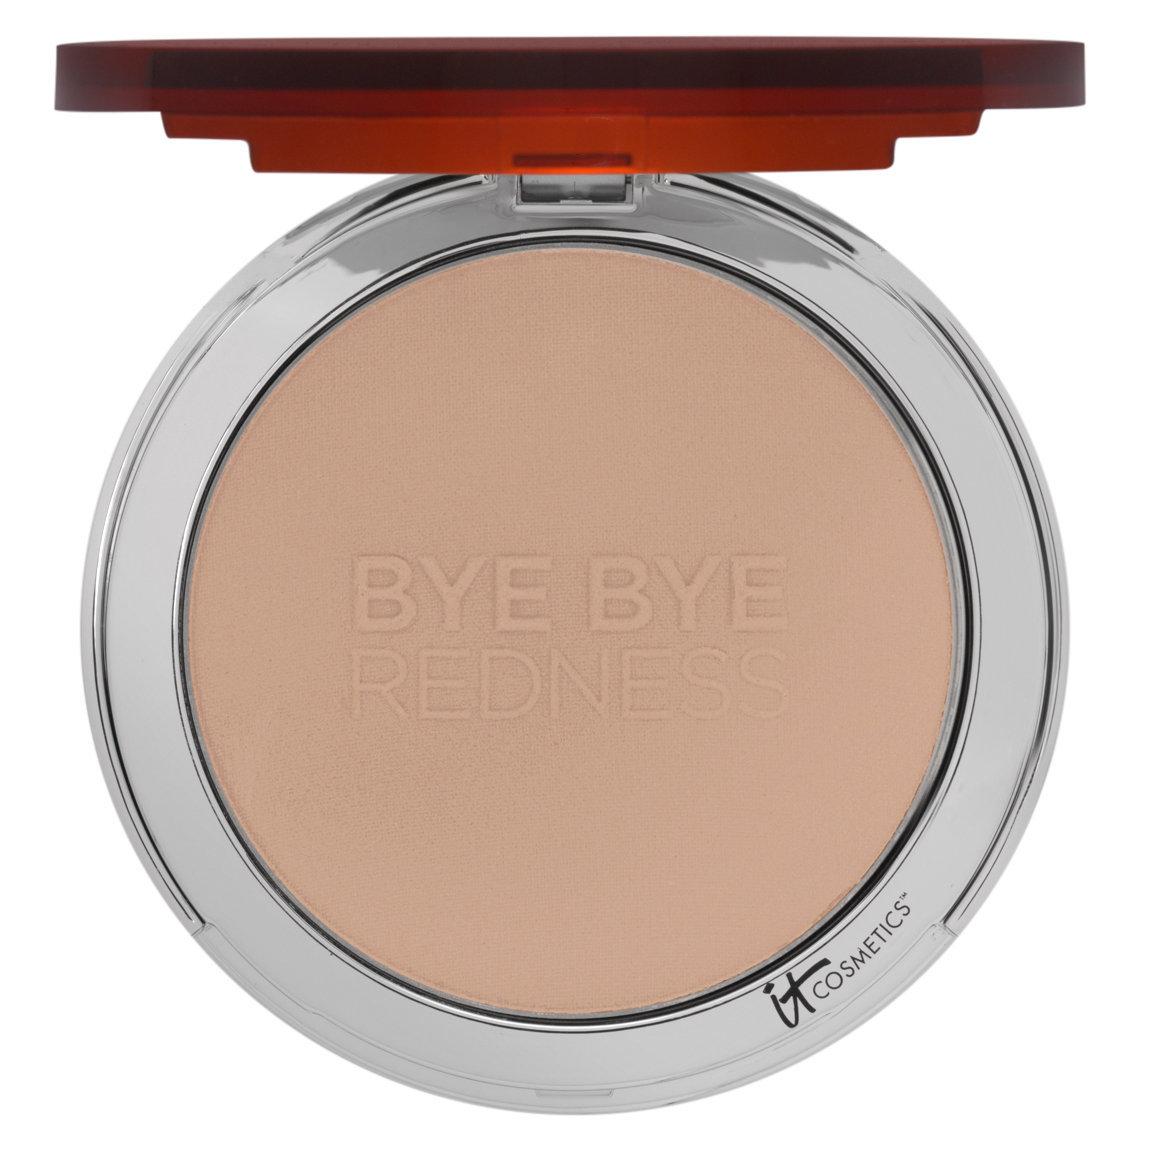 IT Cosmetics  Bye Bye Redness Erasing Correcting Powder Transforming Light Beige alternative view 1.